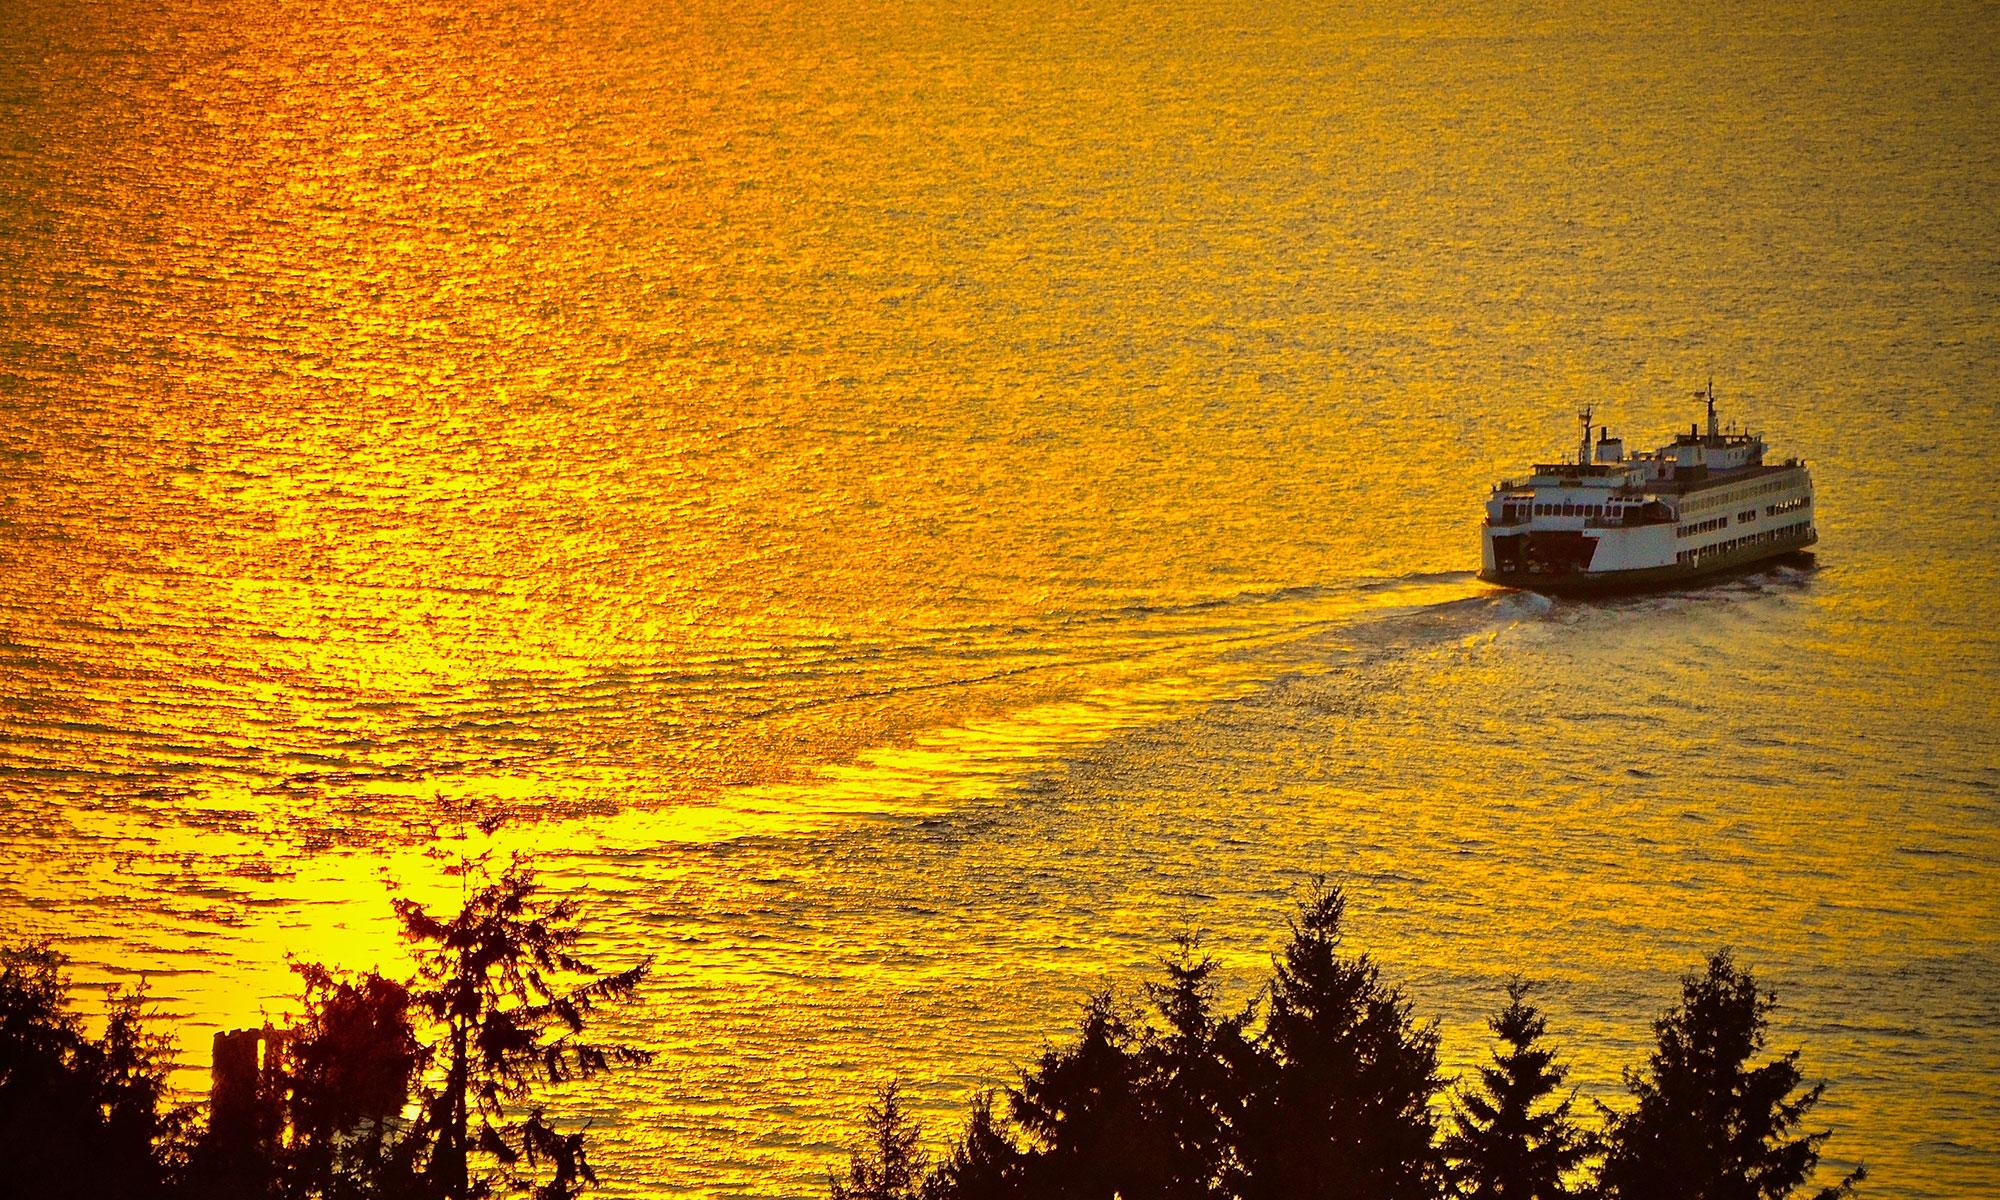 Ferry boat leaving shore